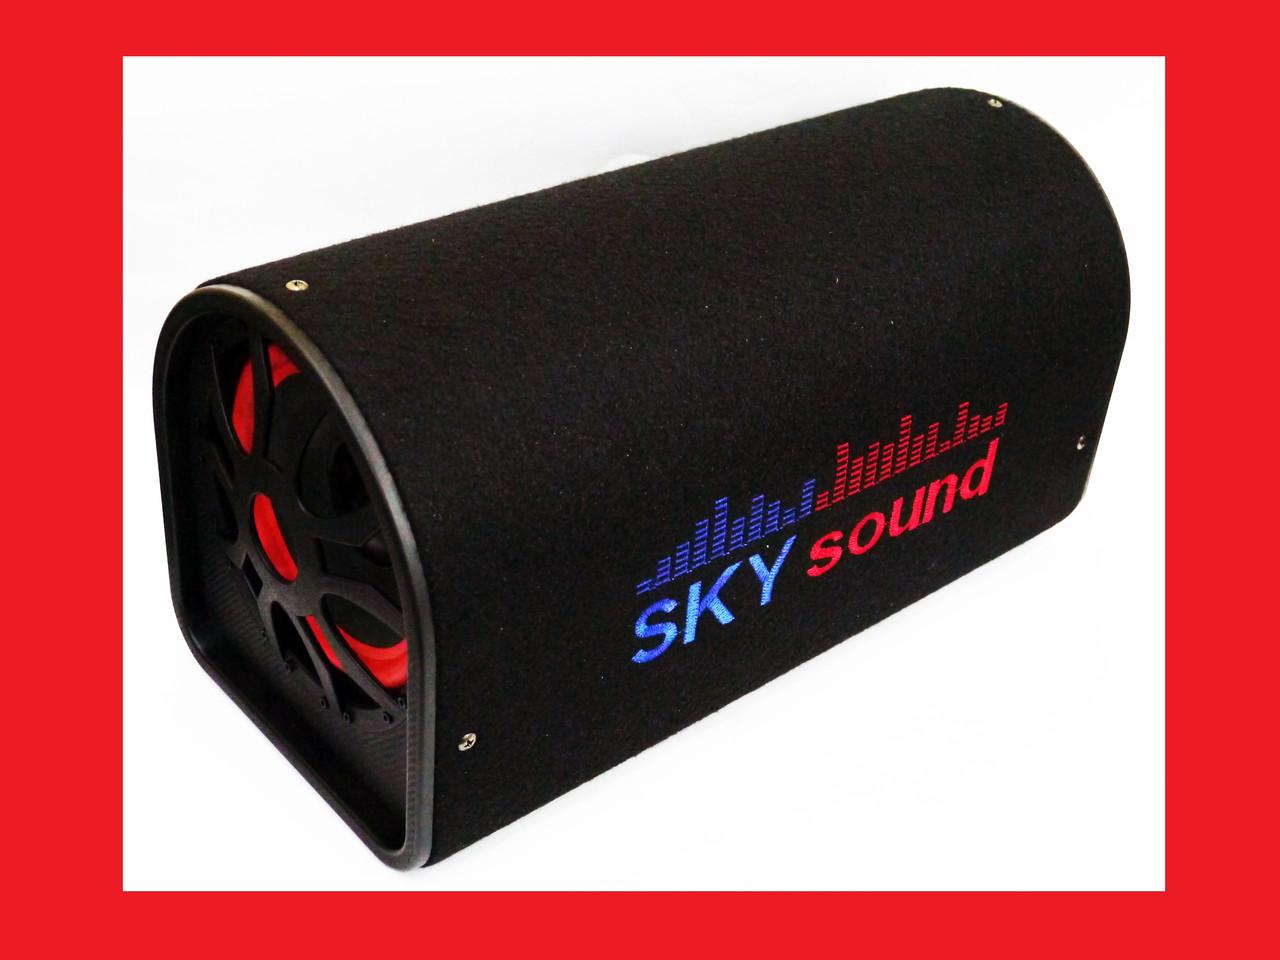 "6"" Активный сабвуфер бочка SKY sound 200W + Bluetooth"